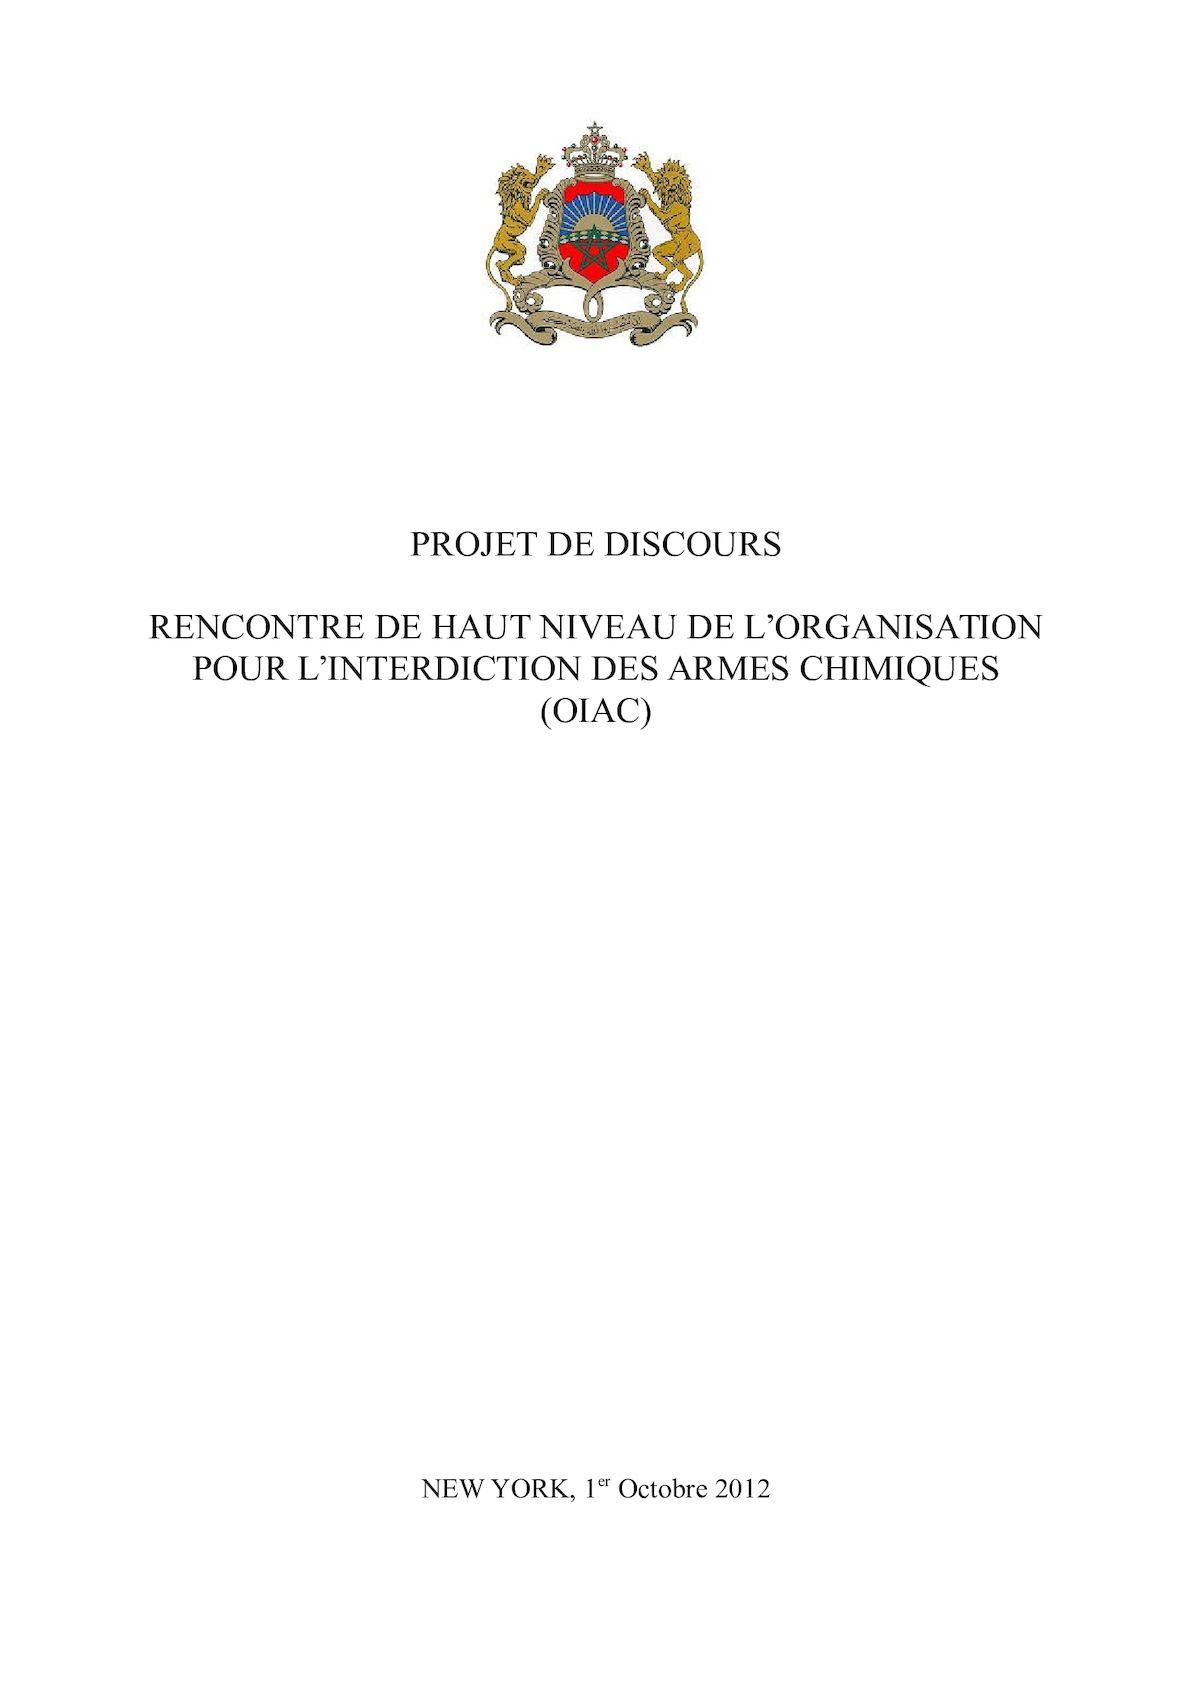 Projet Discours OIAC